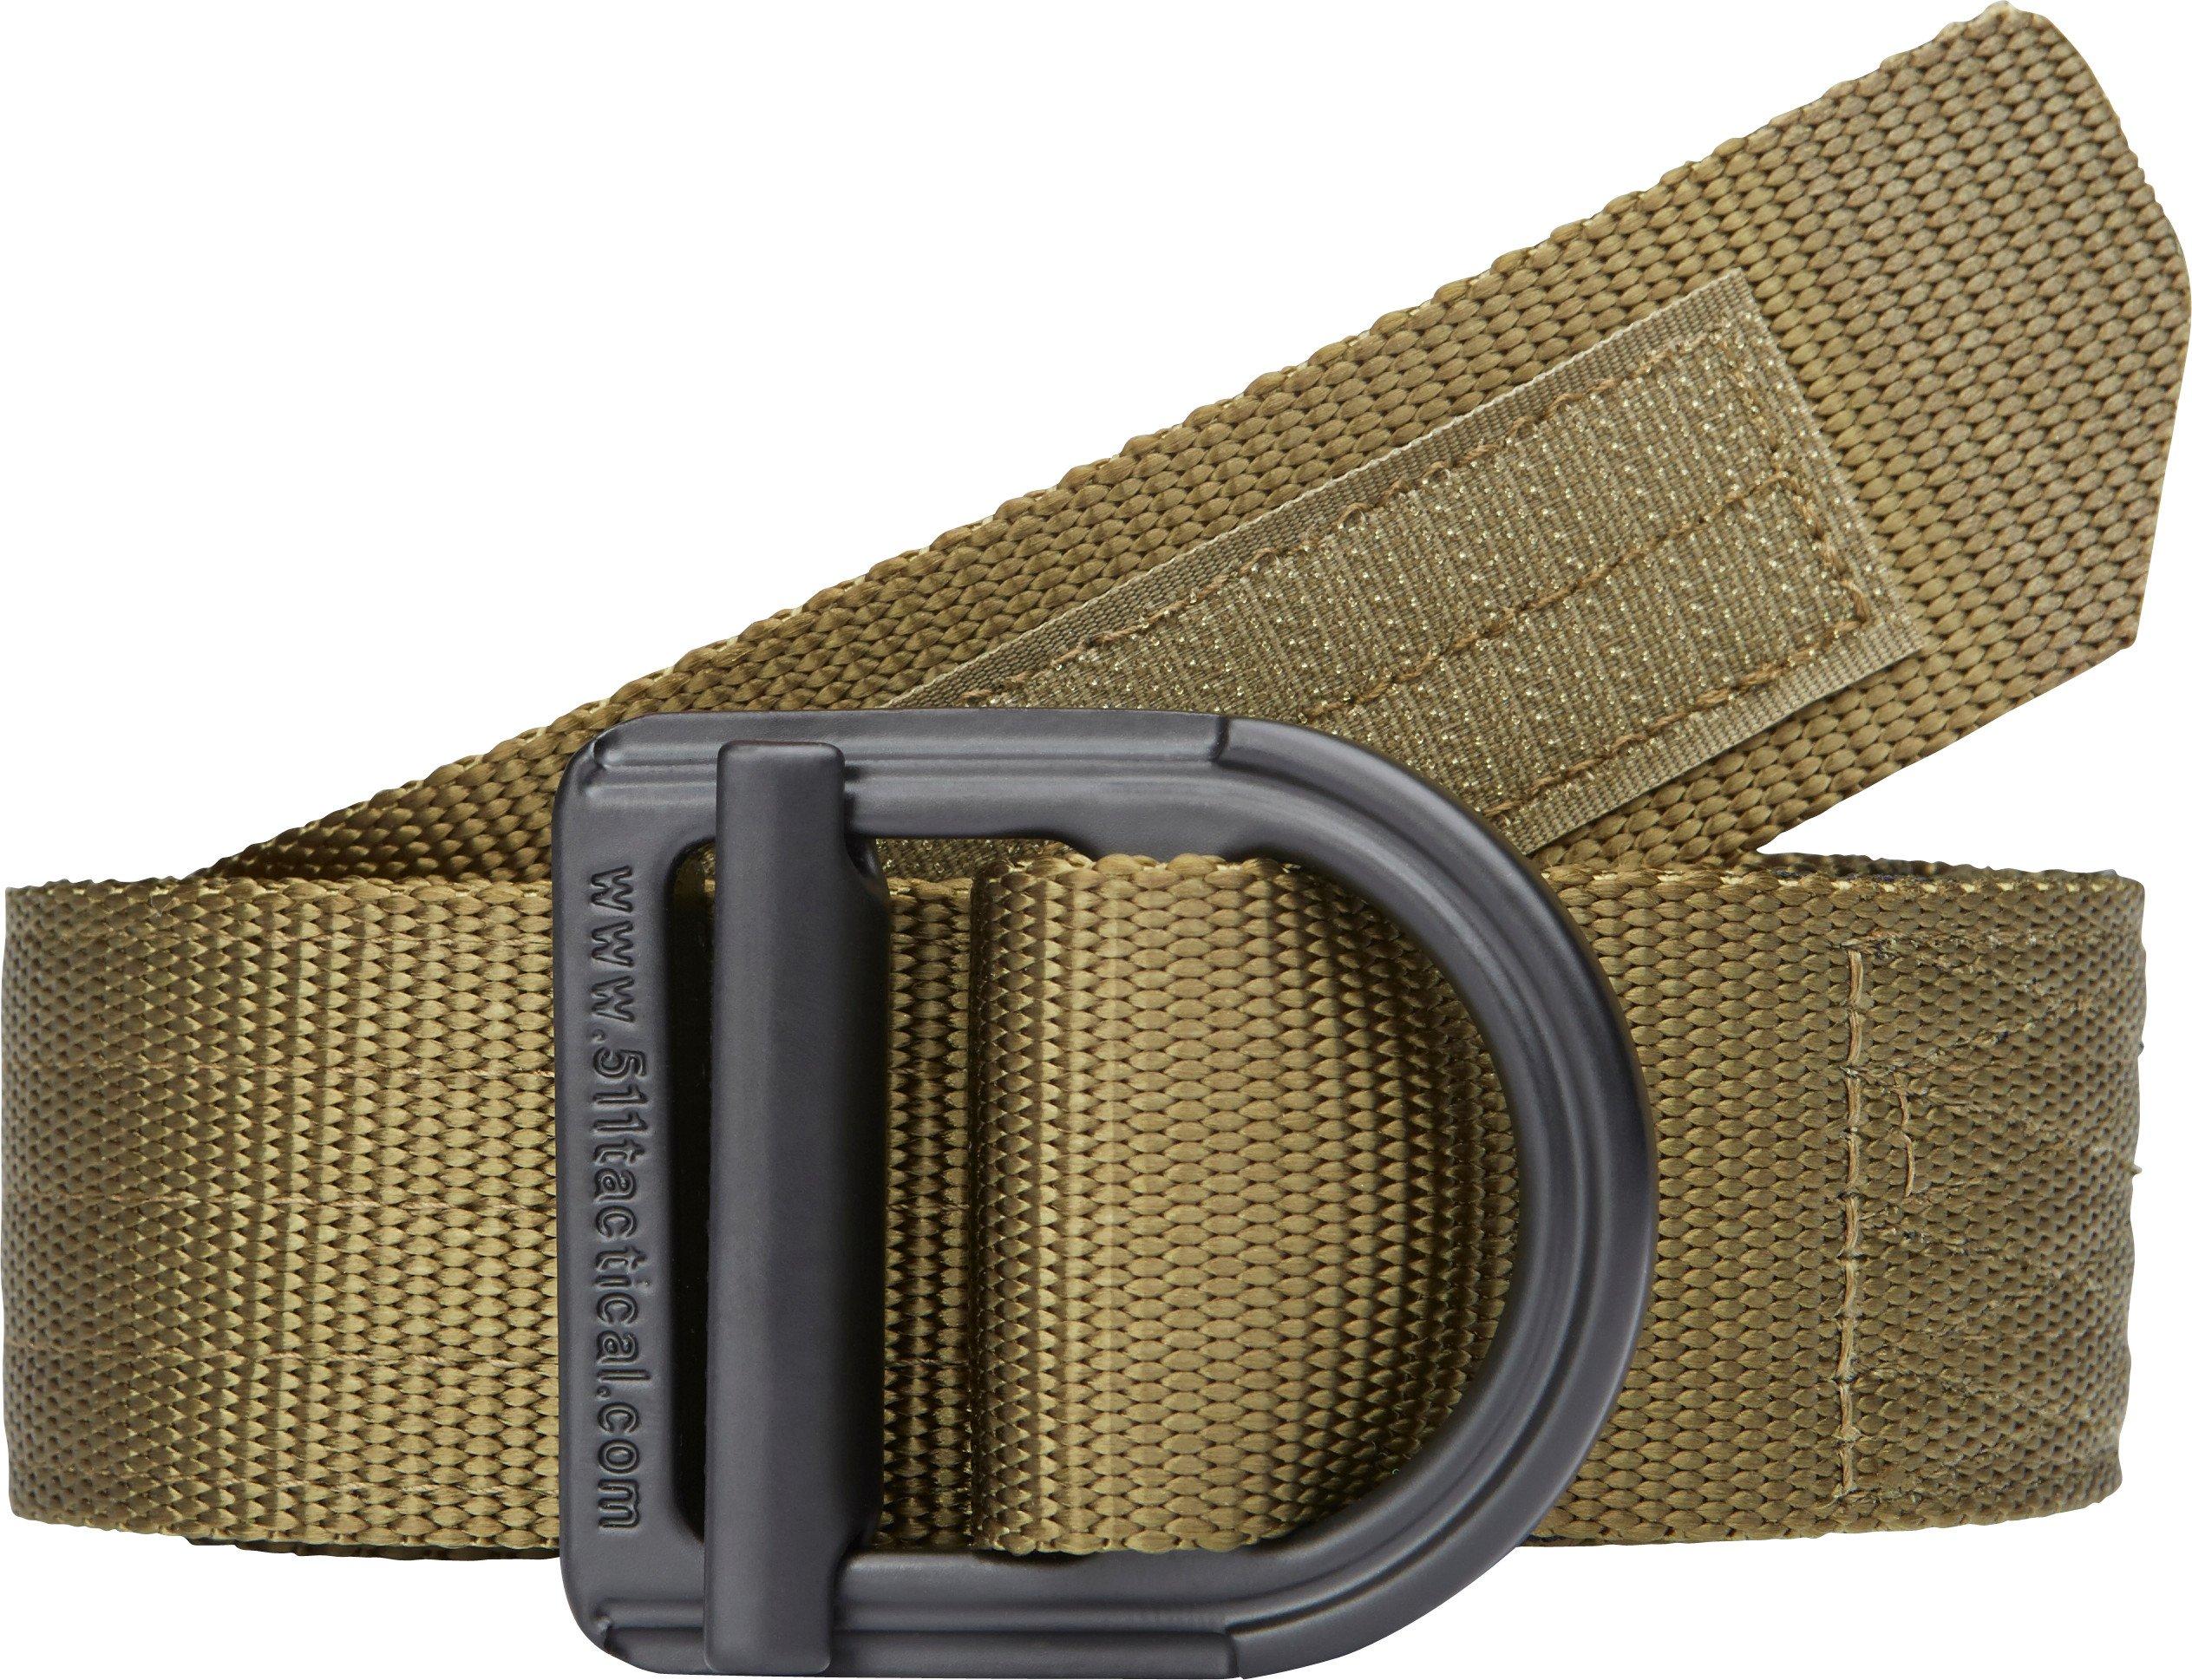 5.11 Tactical EDC Trainer 1 1/2-Inch Belt, TDU Green, Small